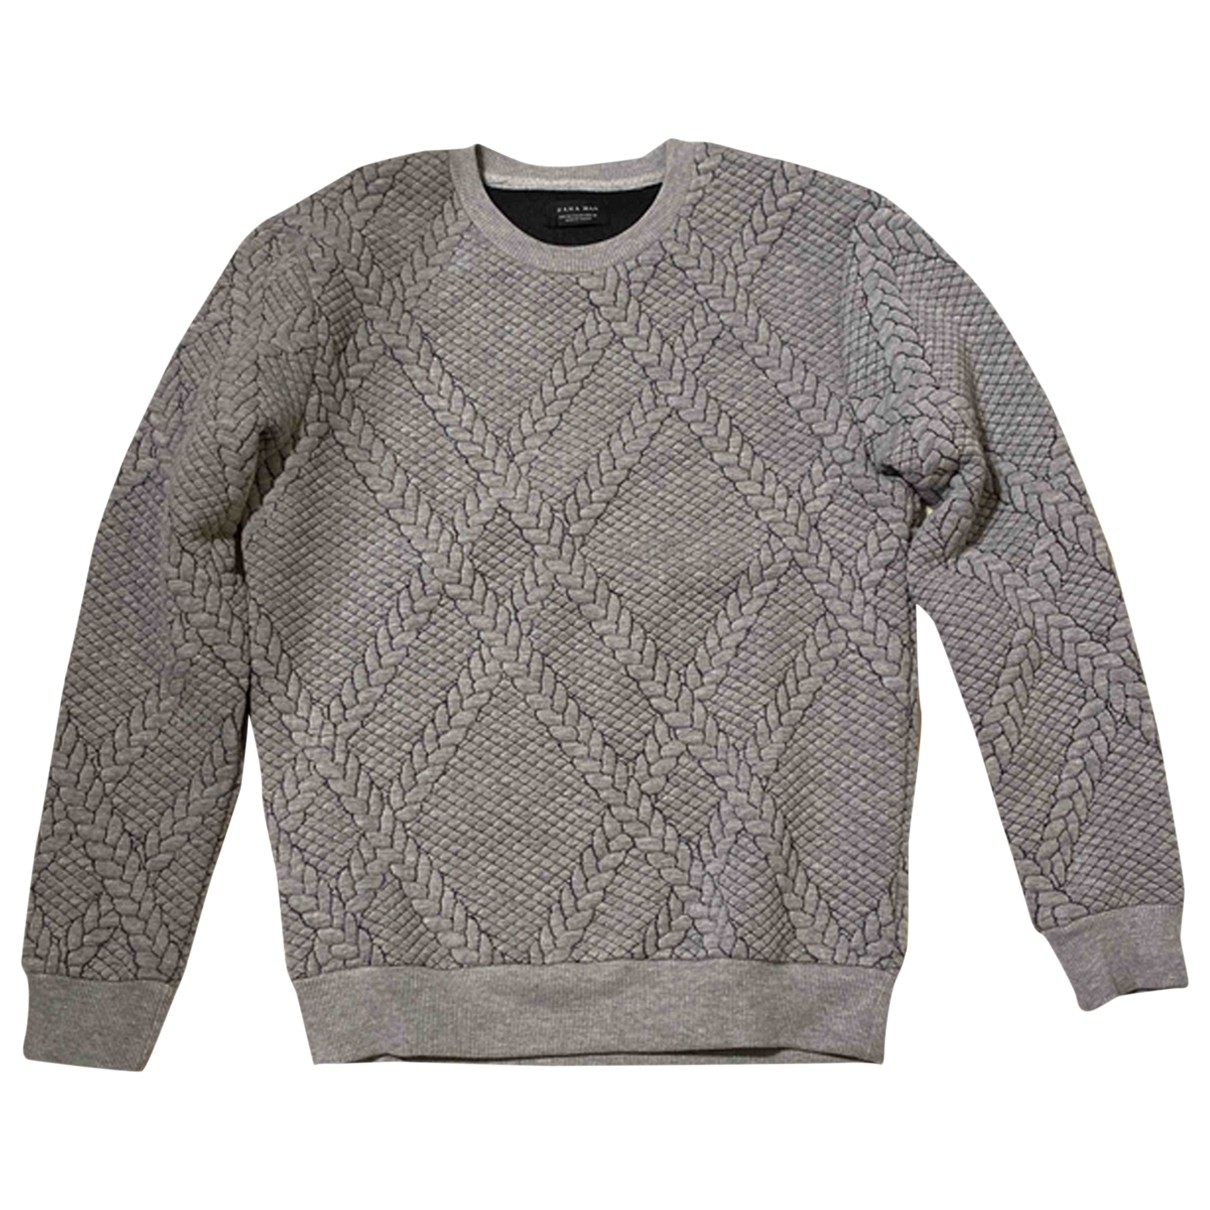 Zara \N Grey Knitwear & Sweatshirts for Men M International